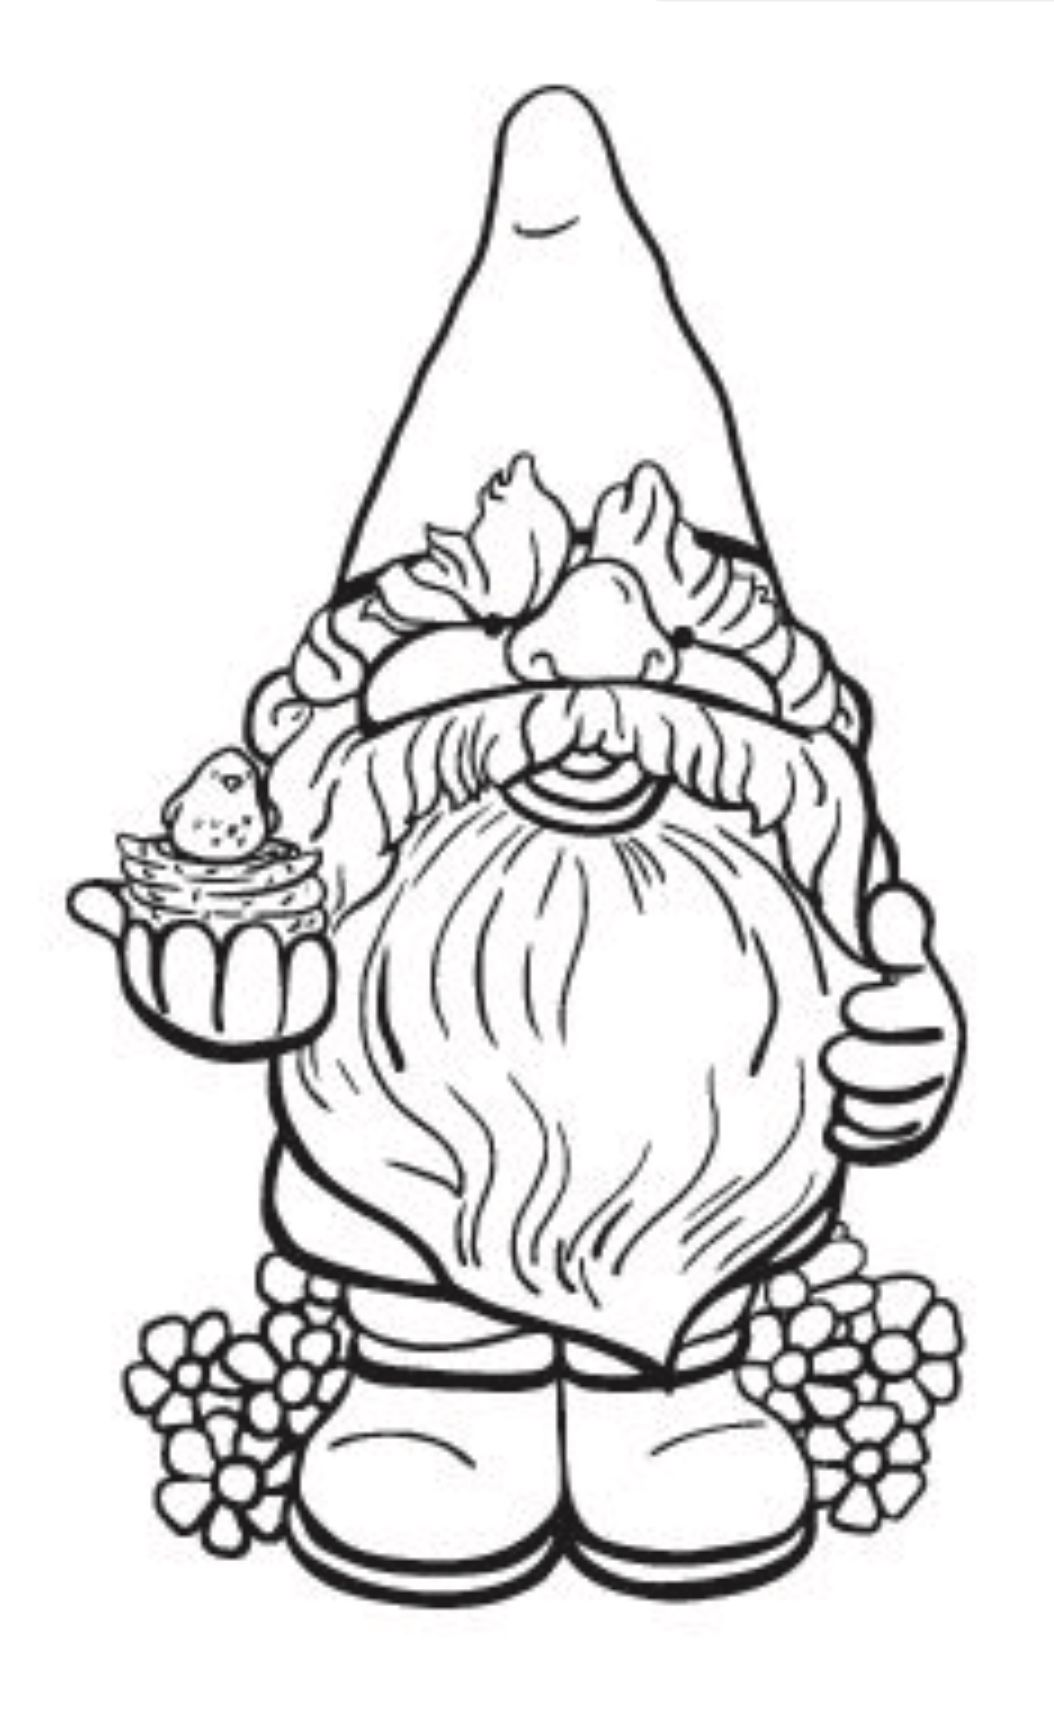 Pin by Patricia Albri on Gnomes | Christmas cartoons, Digi ...